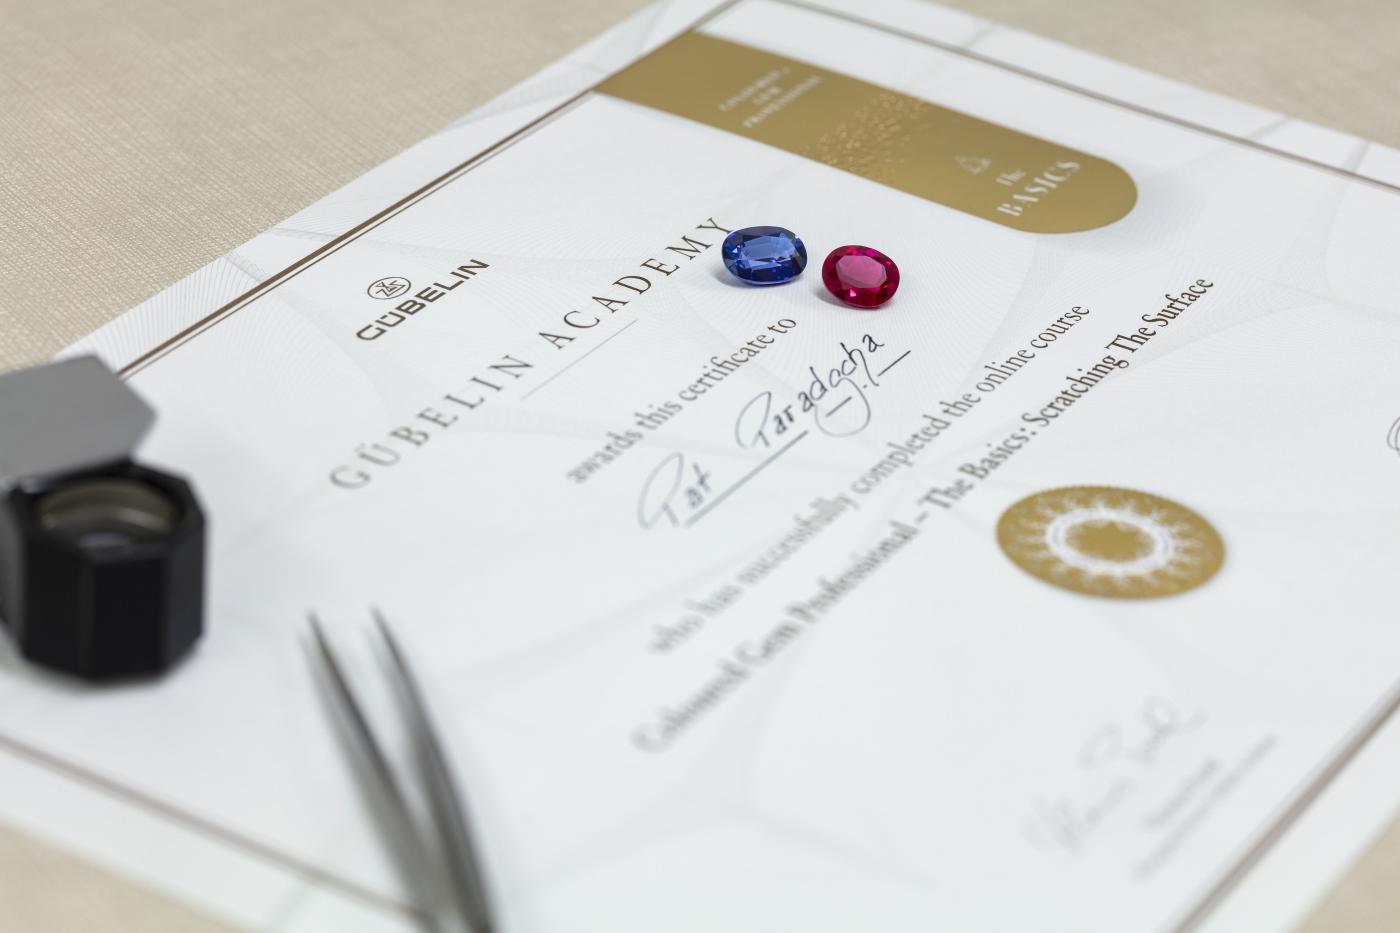 gubelin_academy_online_the_basics_certificate_-_europa_star_magazine_2021